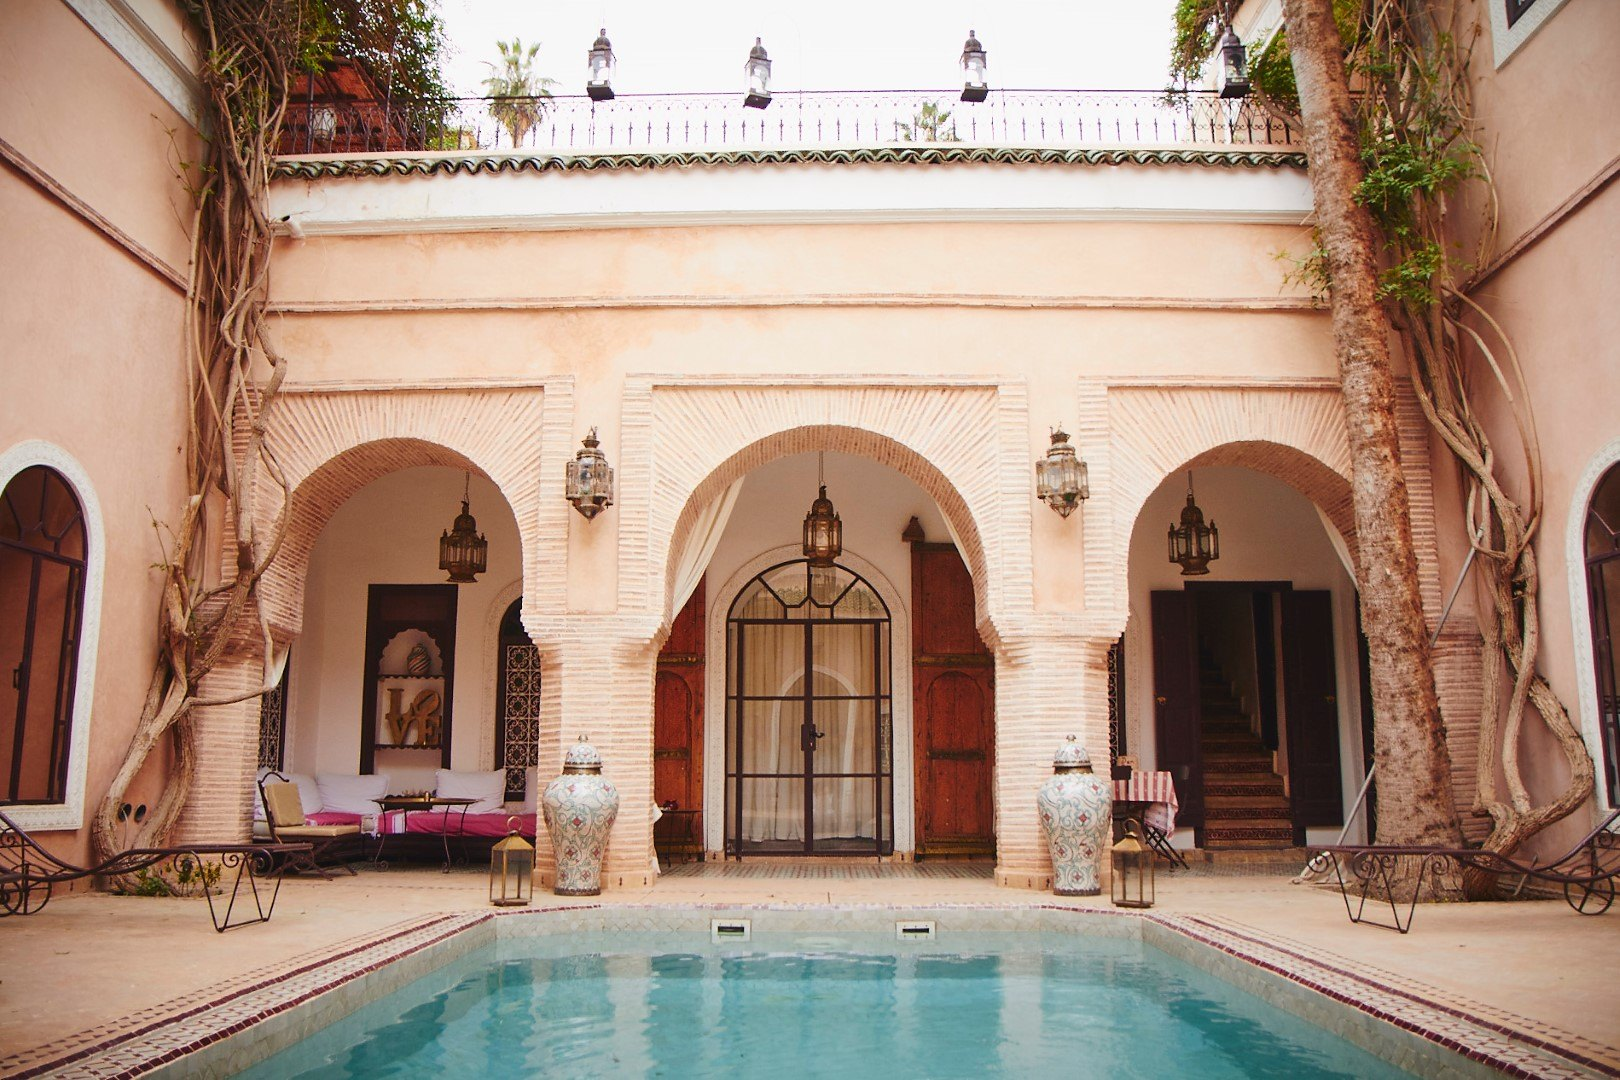 Somptueux riad avec piscine chauff e dans l un des for Riad marrakech piscine chauffee